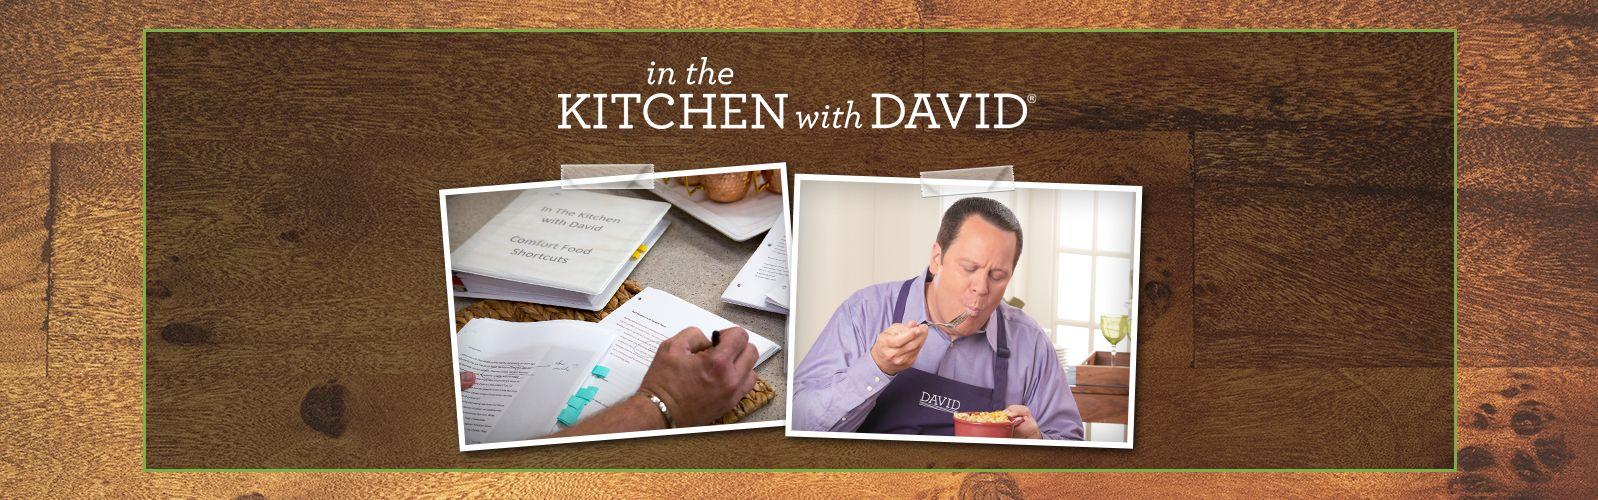 in the kitchen with david qvc com rh qvc com